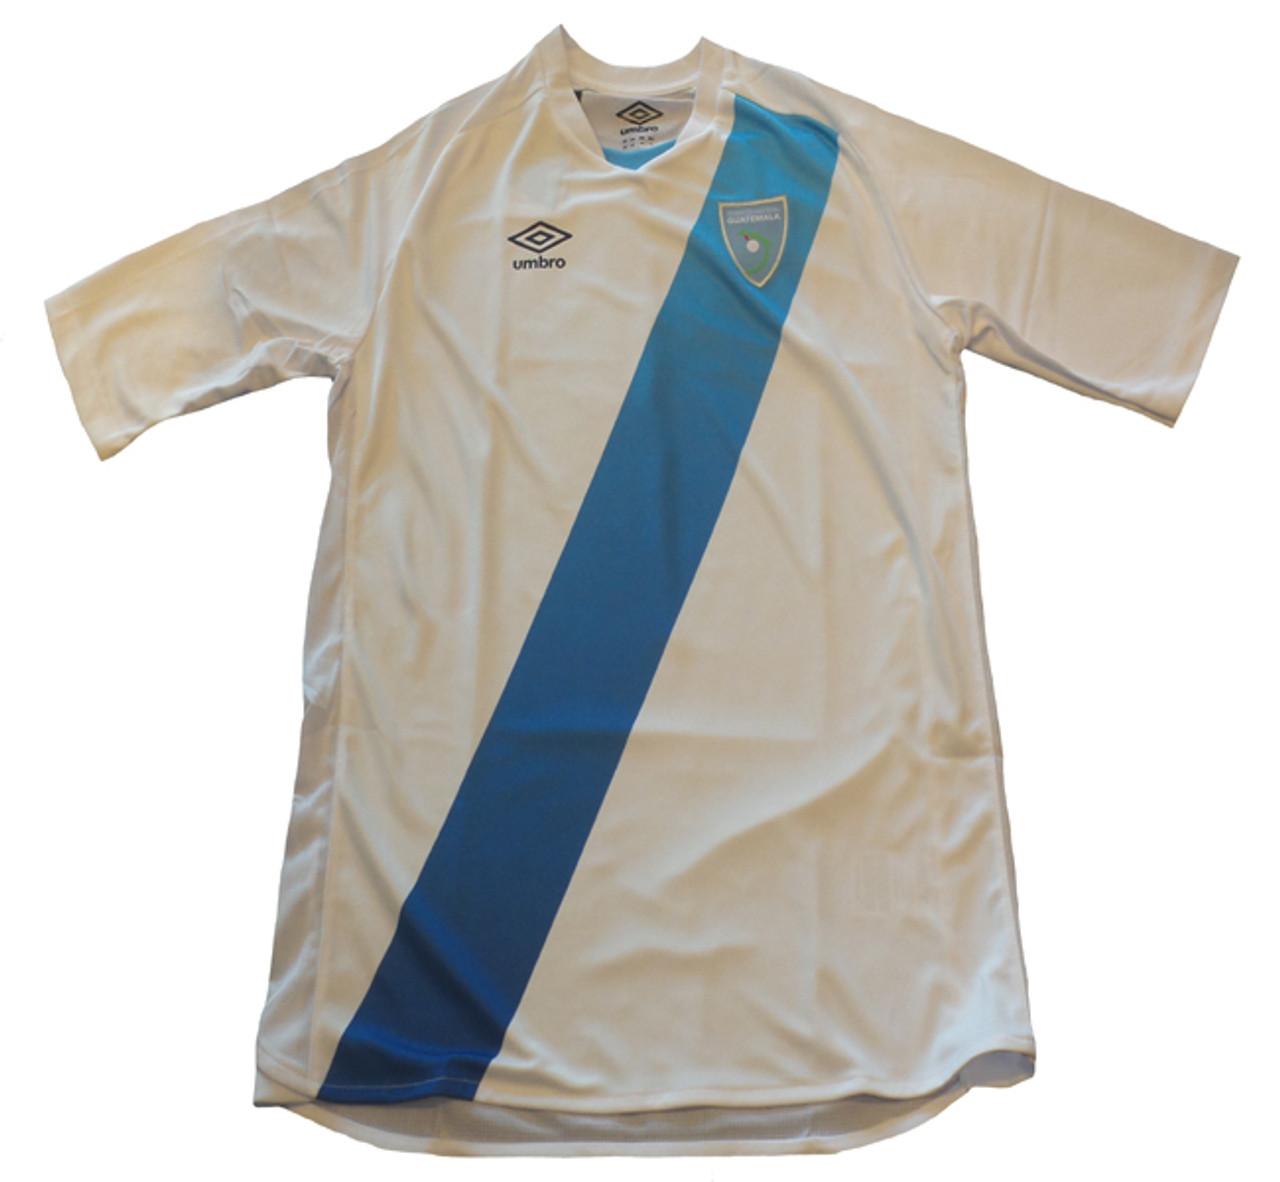 umbro guatemala jersey 2018